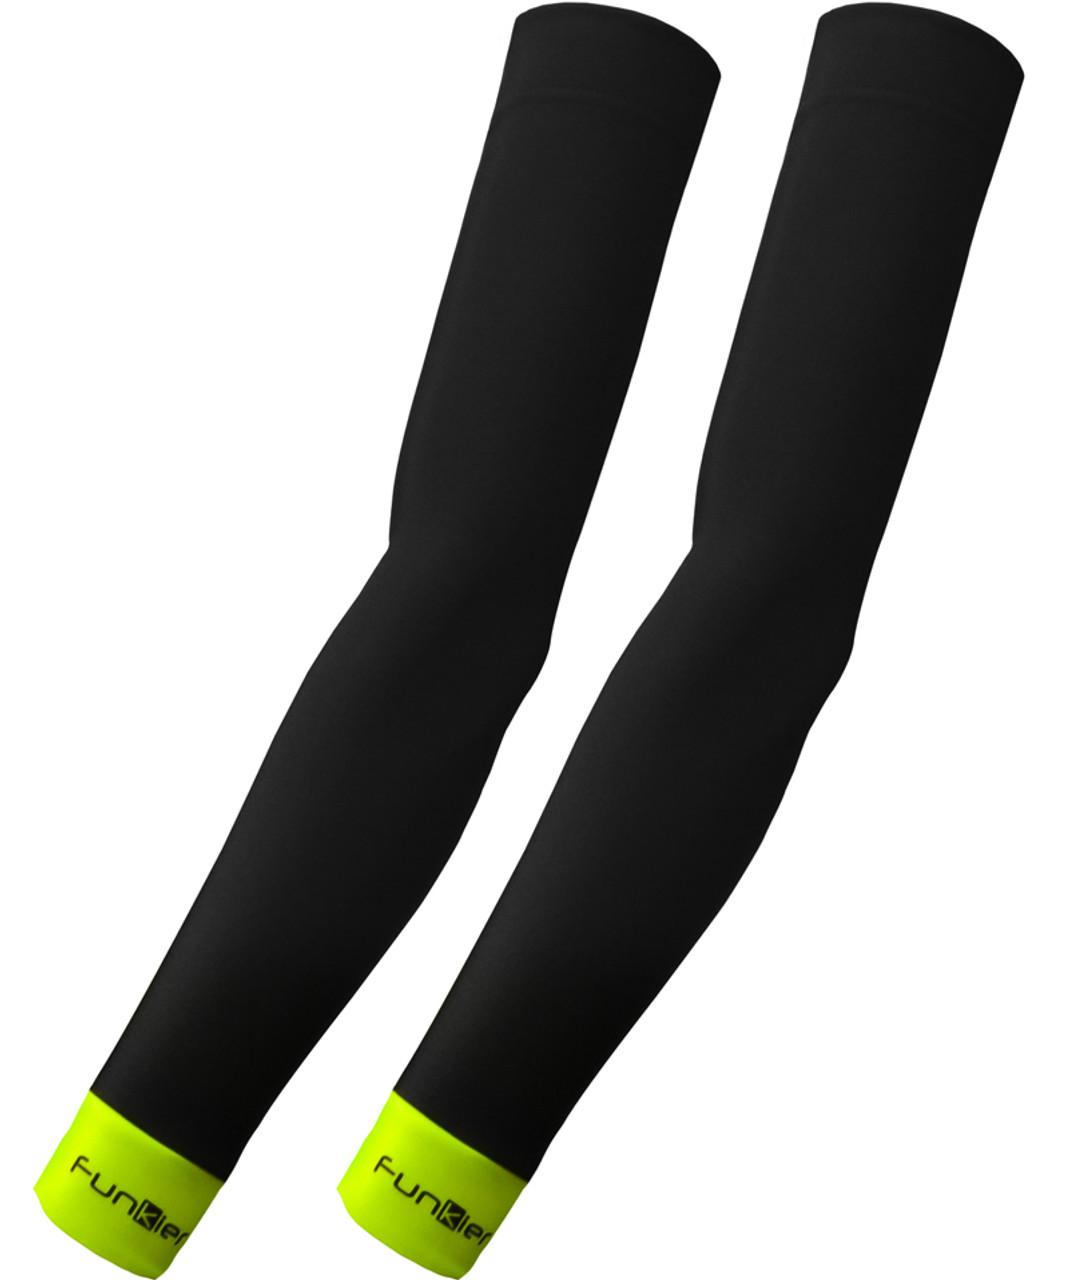 Funkier Repel Windproof Water-Resistant Thermal Arm Warmers | LW-658